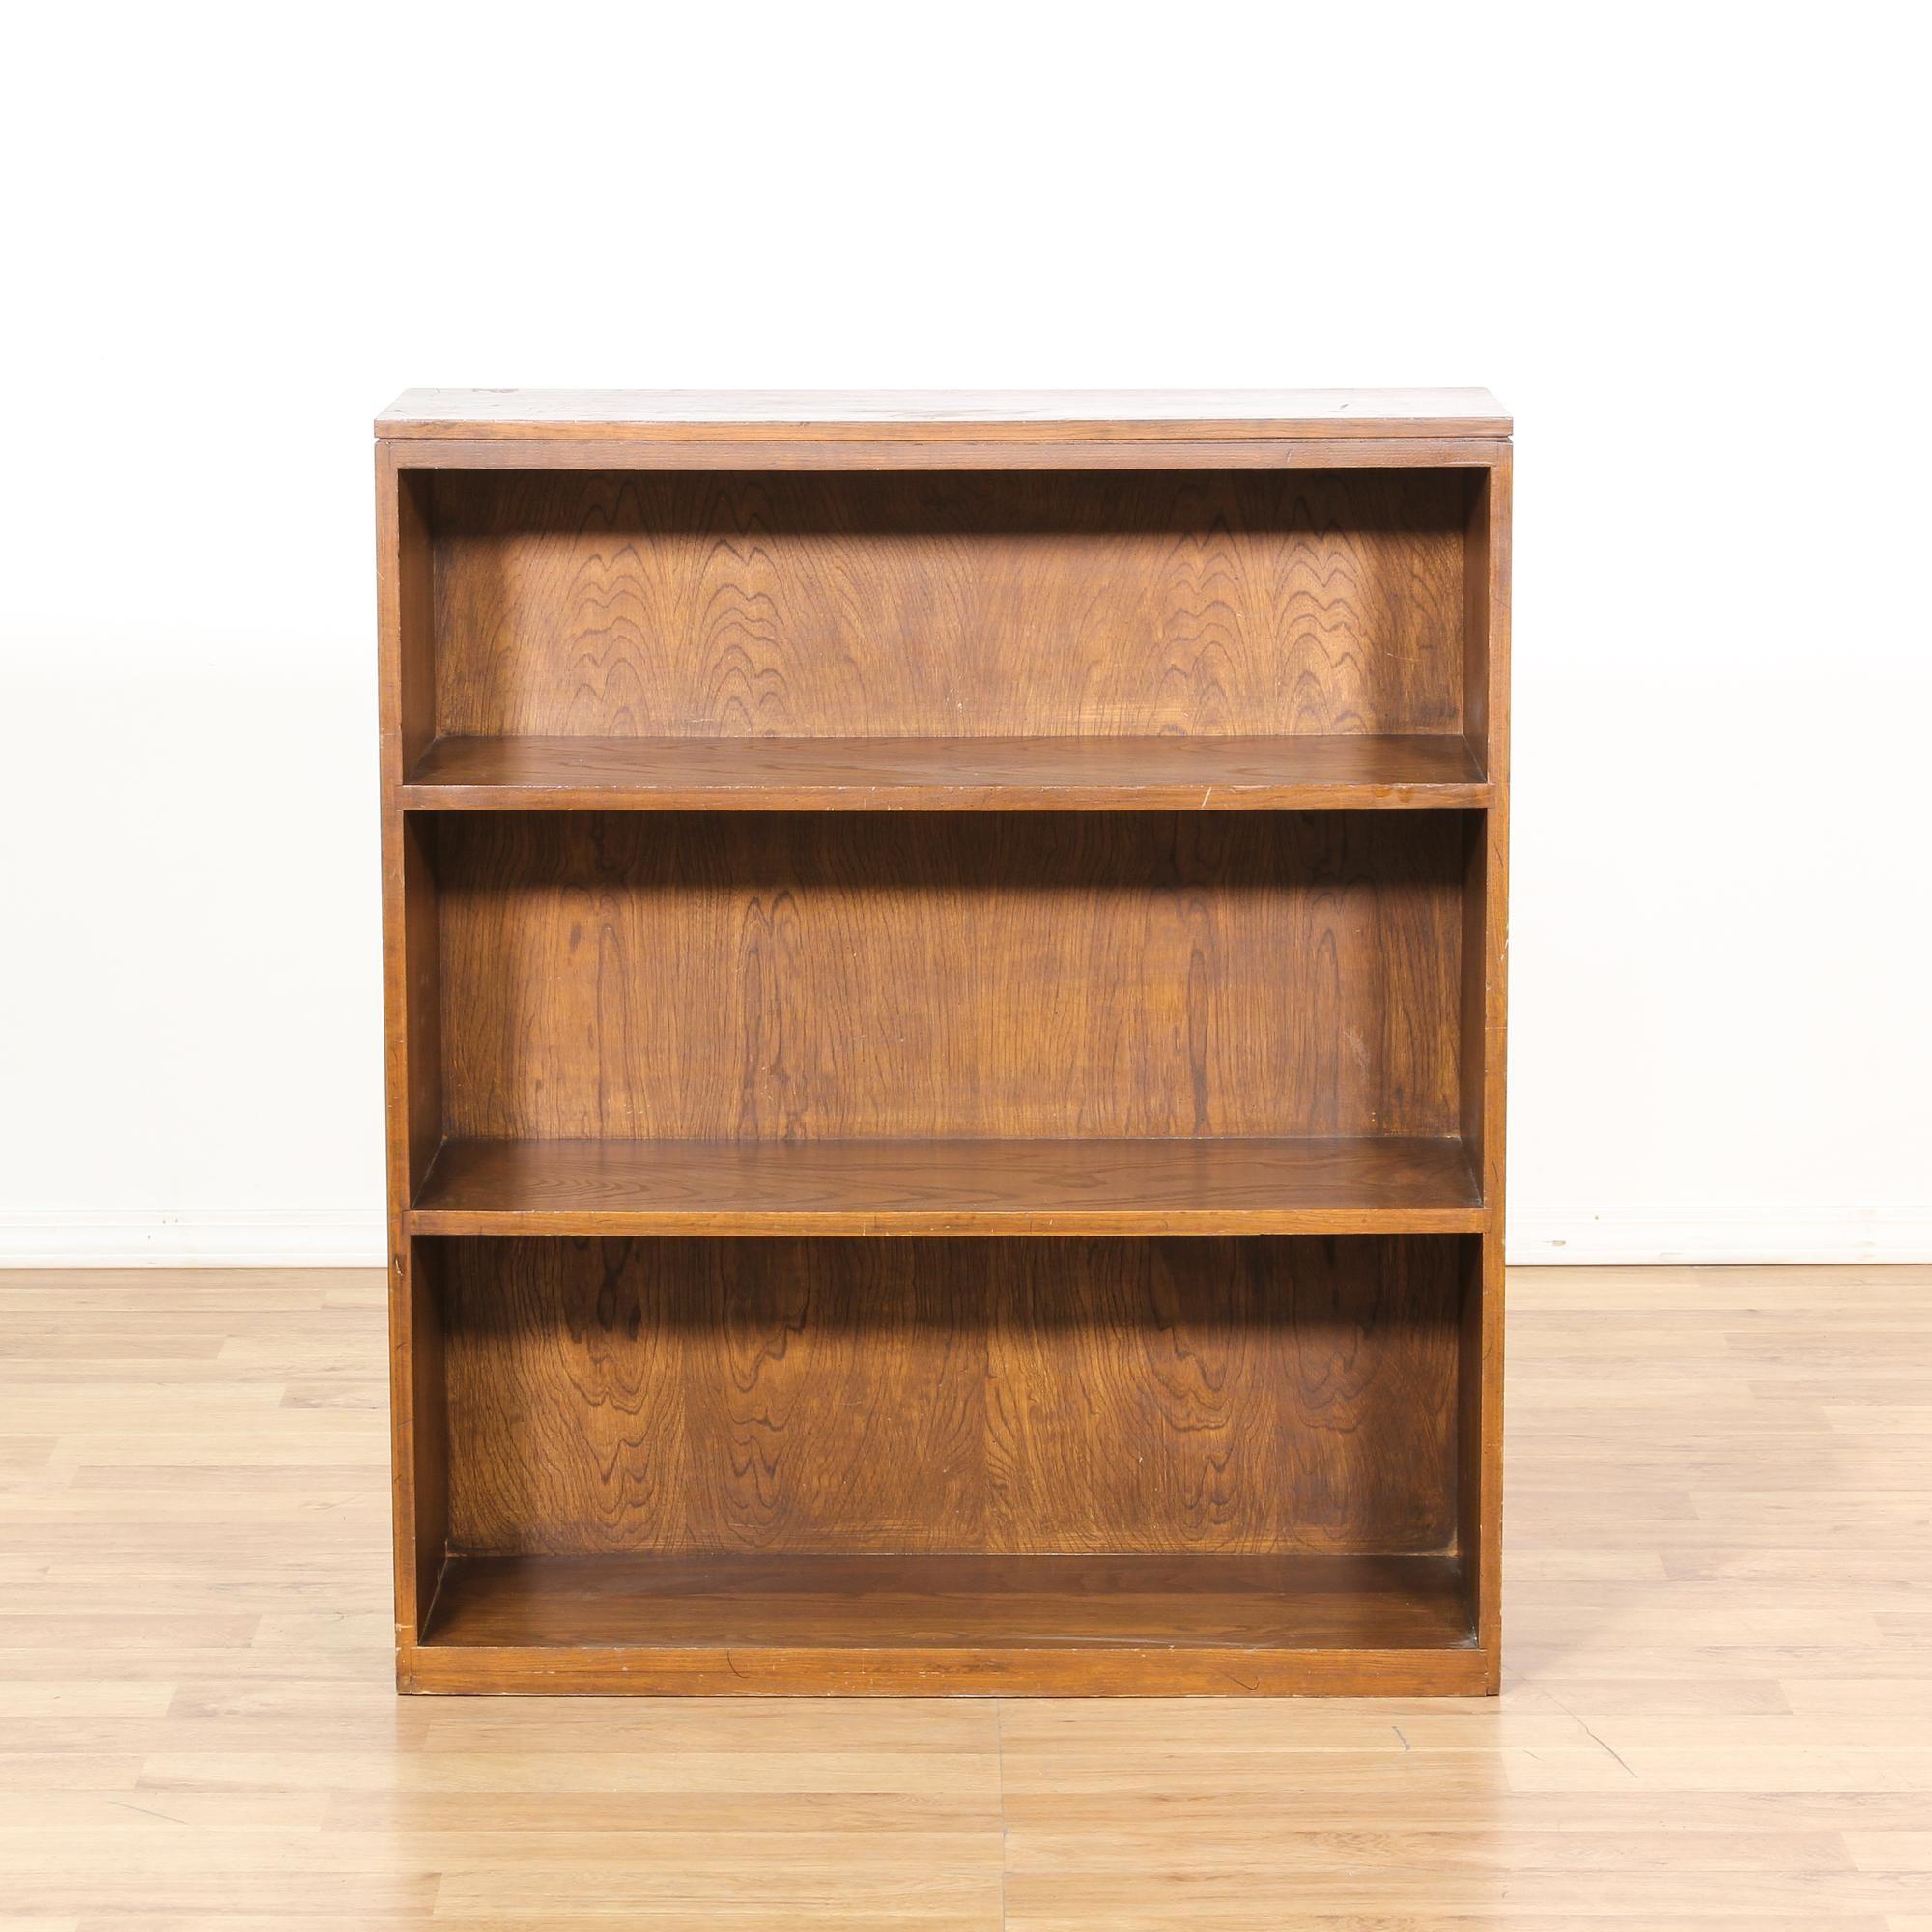 customizable open hayneedle eagle bookcase product dark furniture oak bookcases eaglefurnitureoakridgeopenbookcase cfm ridge master wood